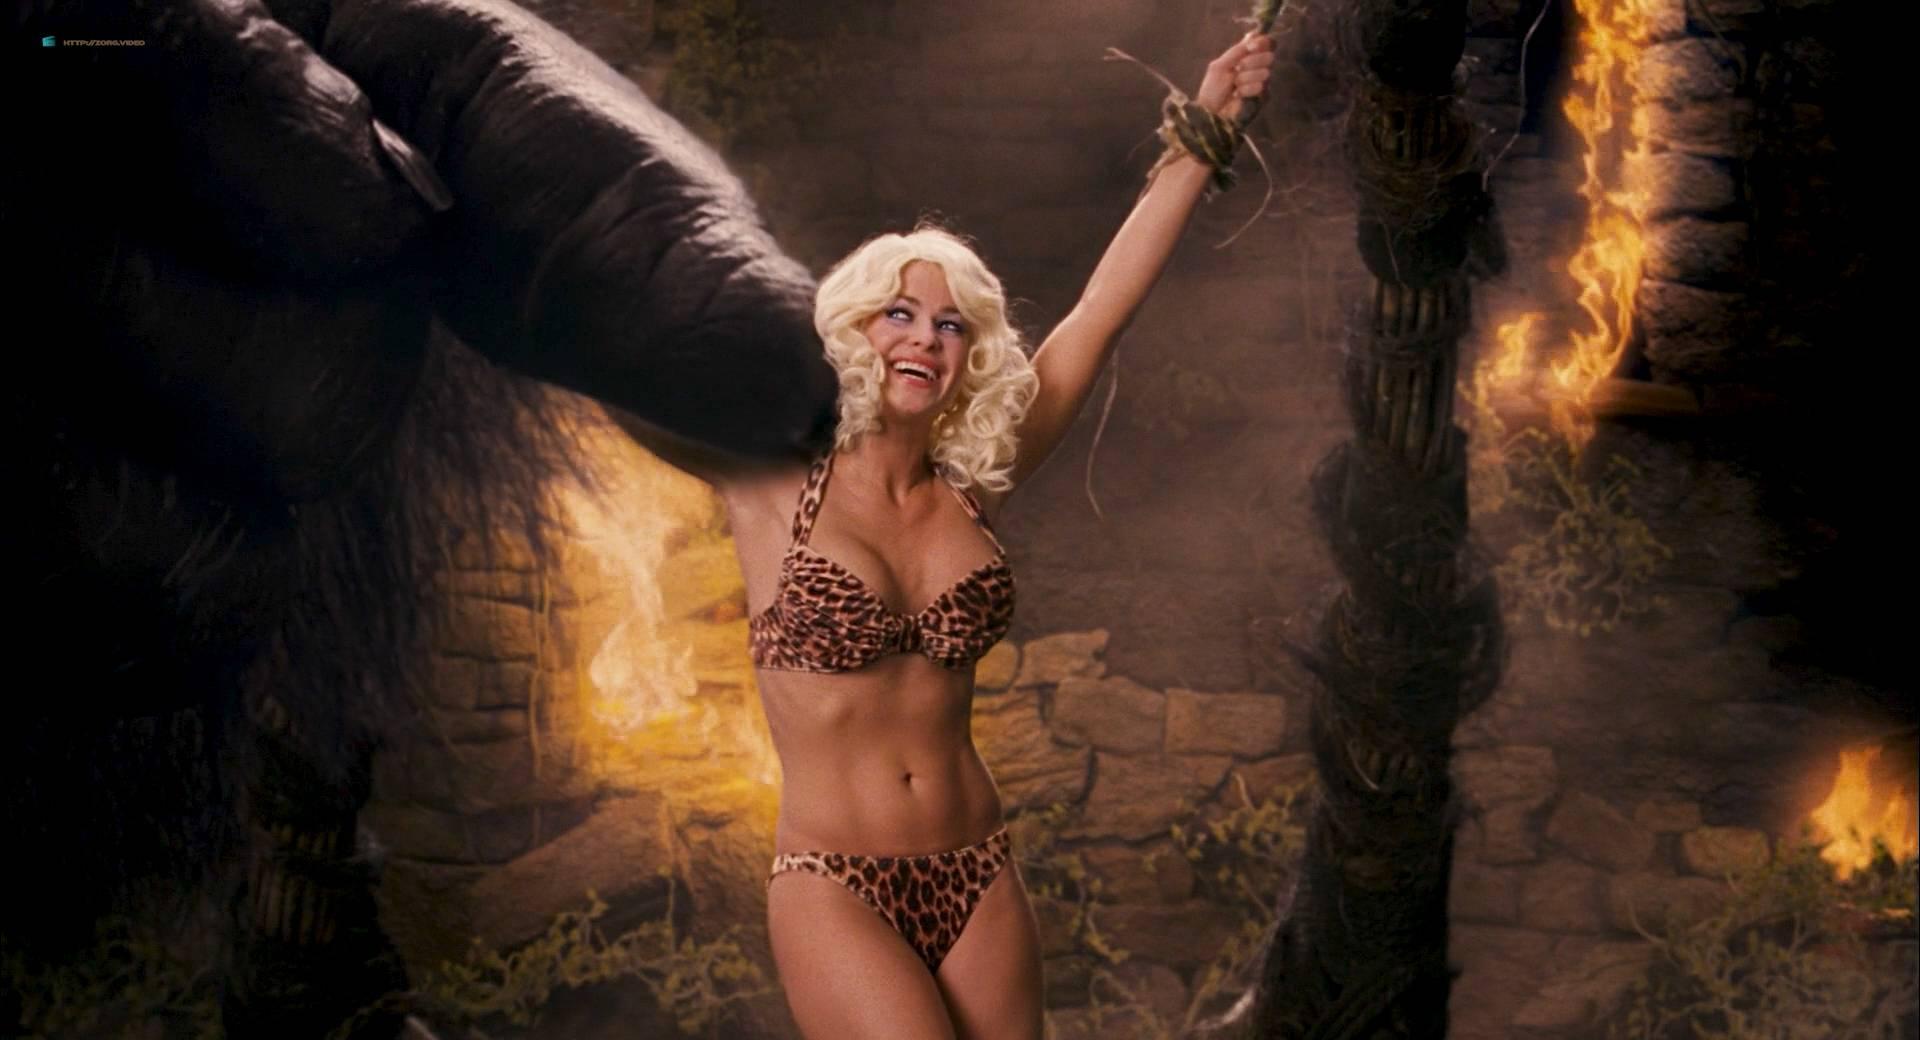 Carmen electra date movie scene 9